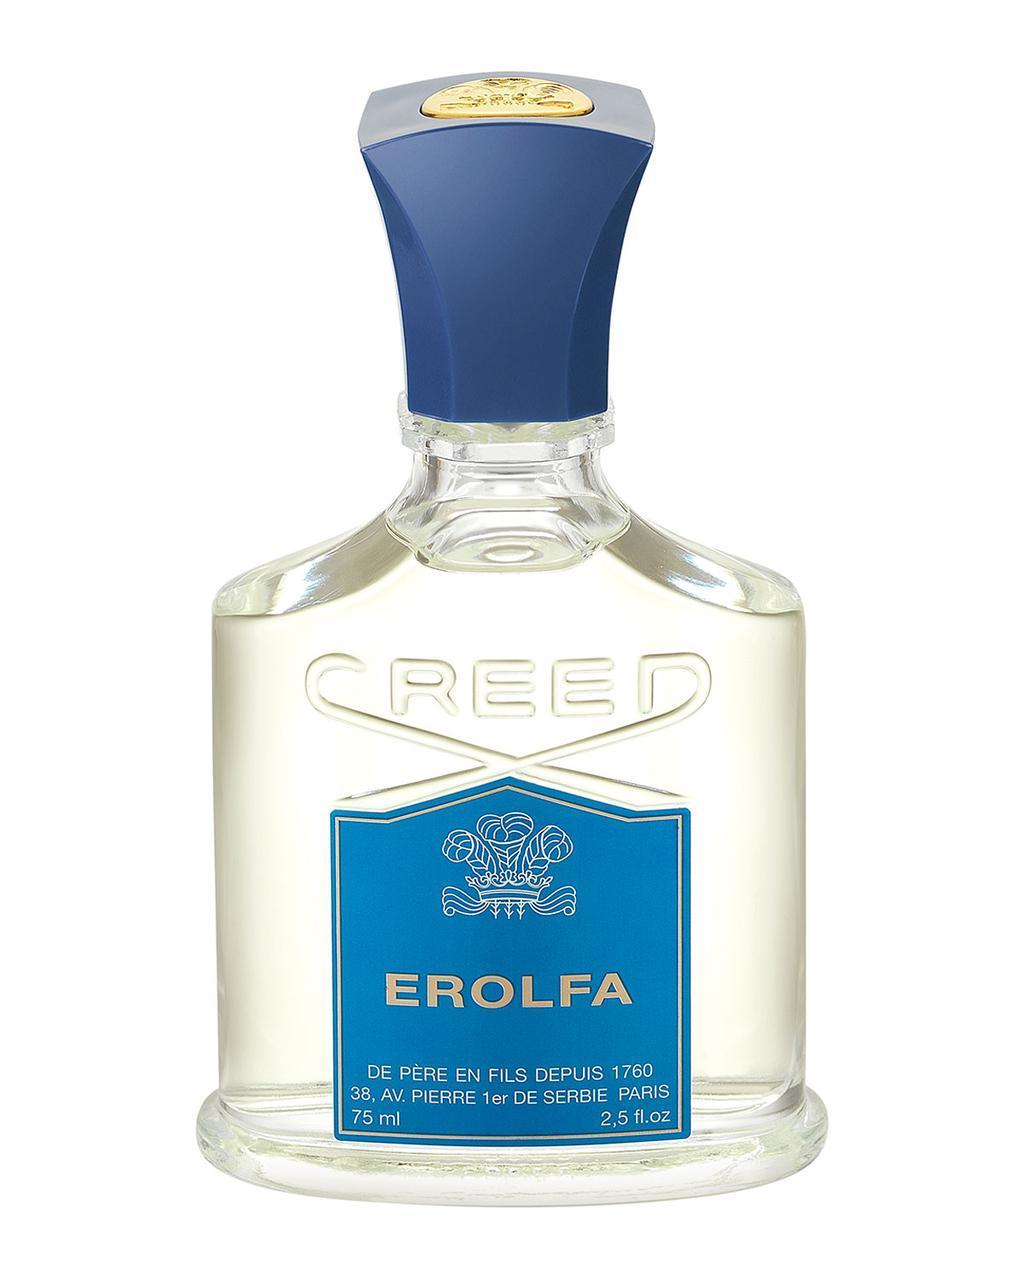 Creed Erolfa edp 125ml Tester, France